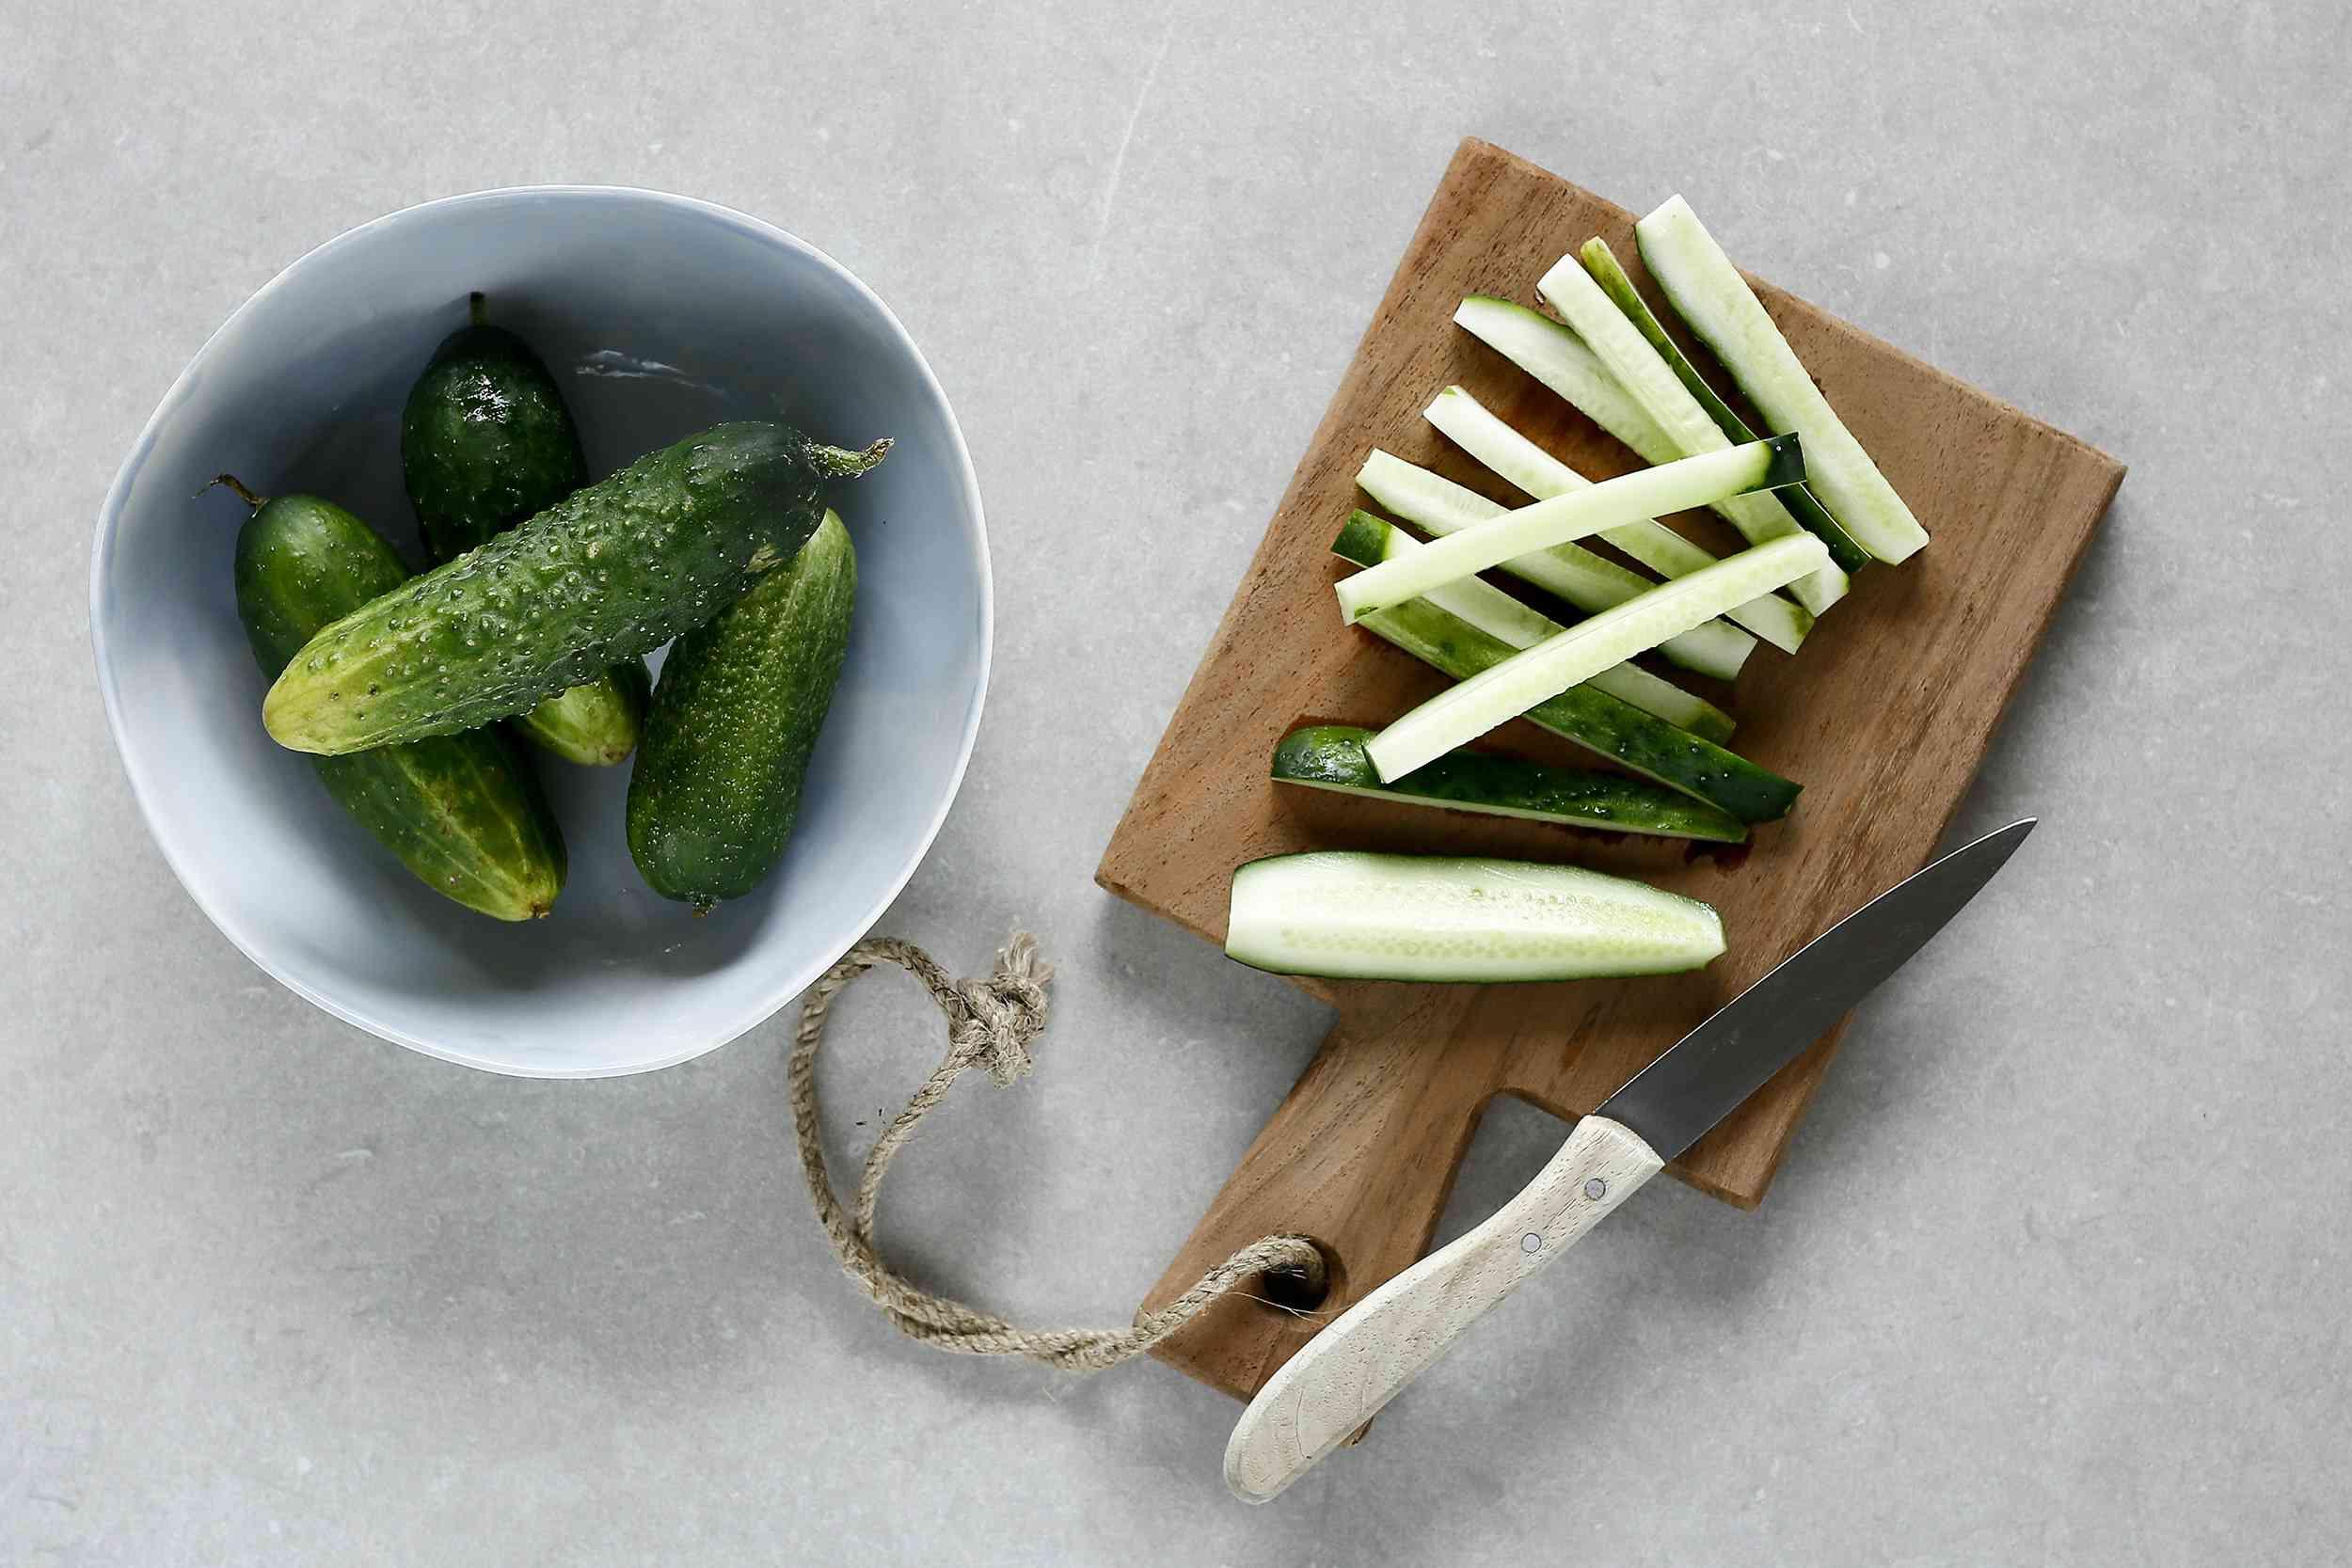 cucumbers cut into strips on a wood cutting board